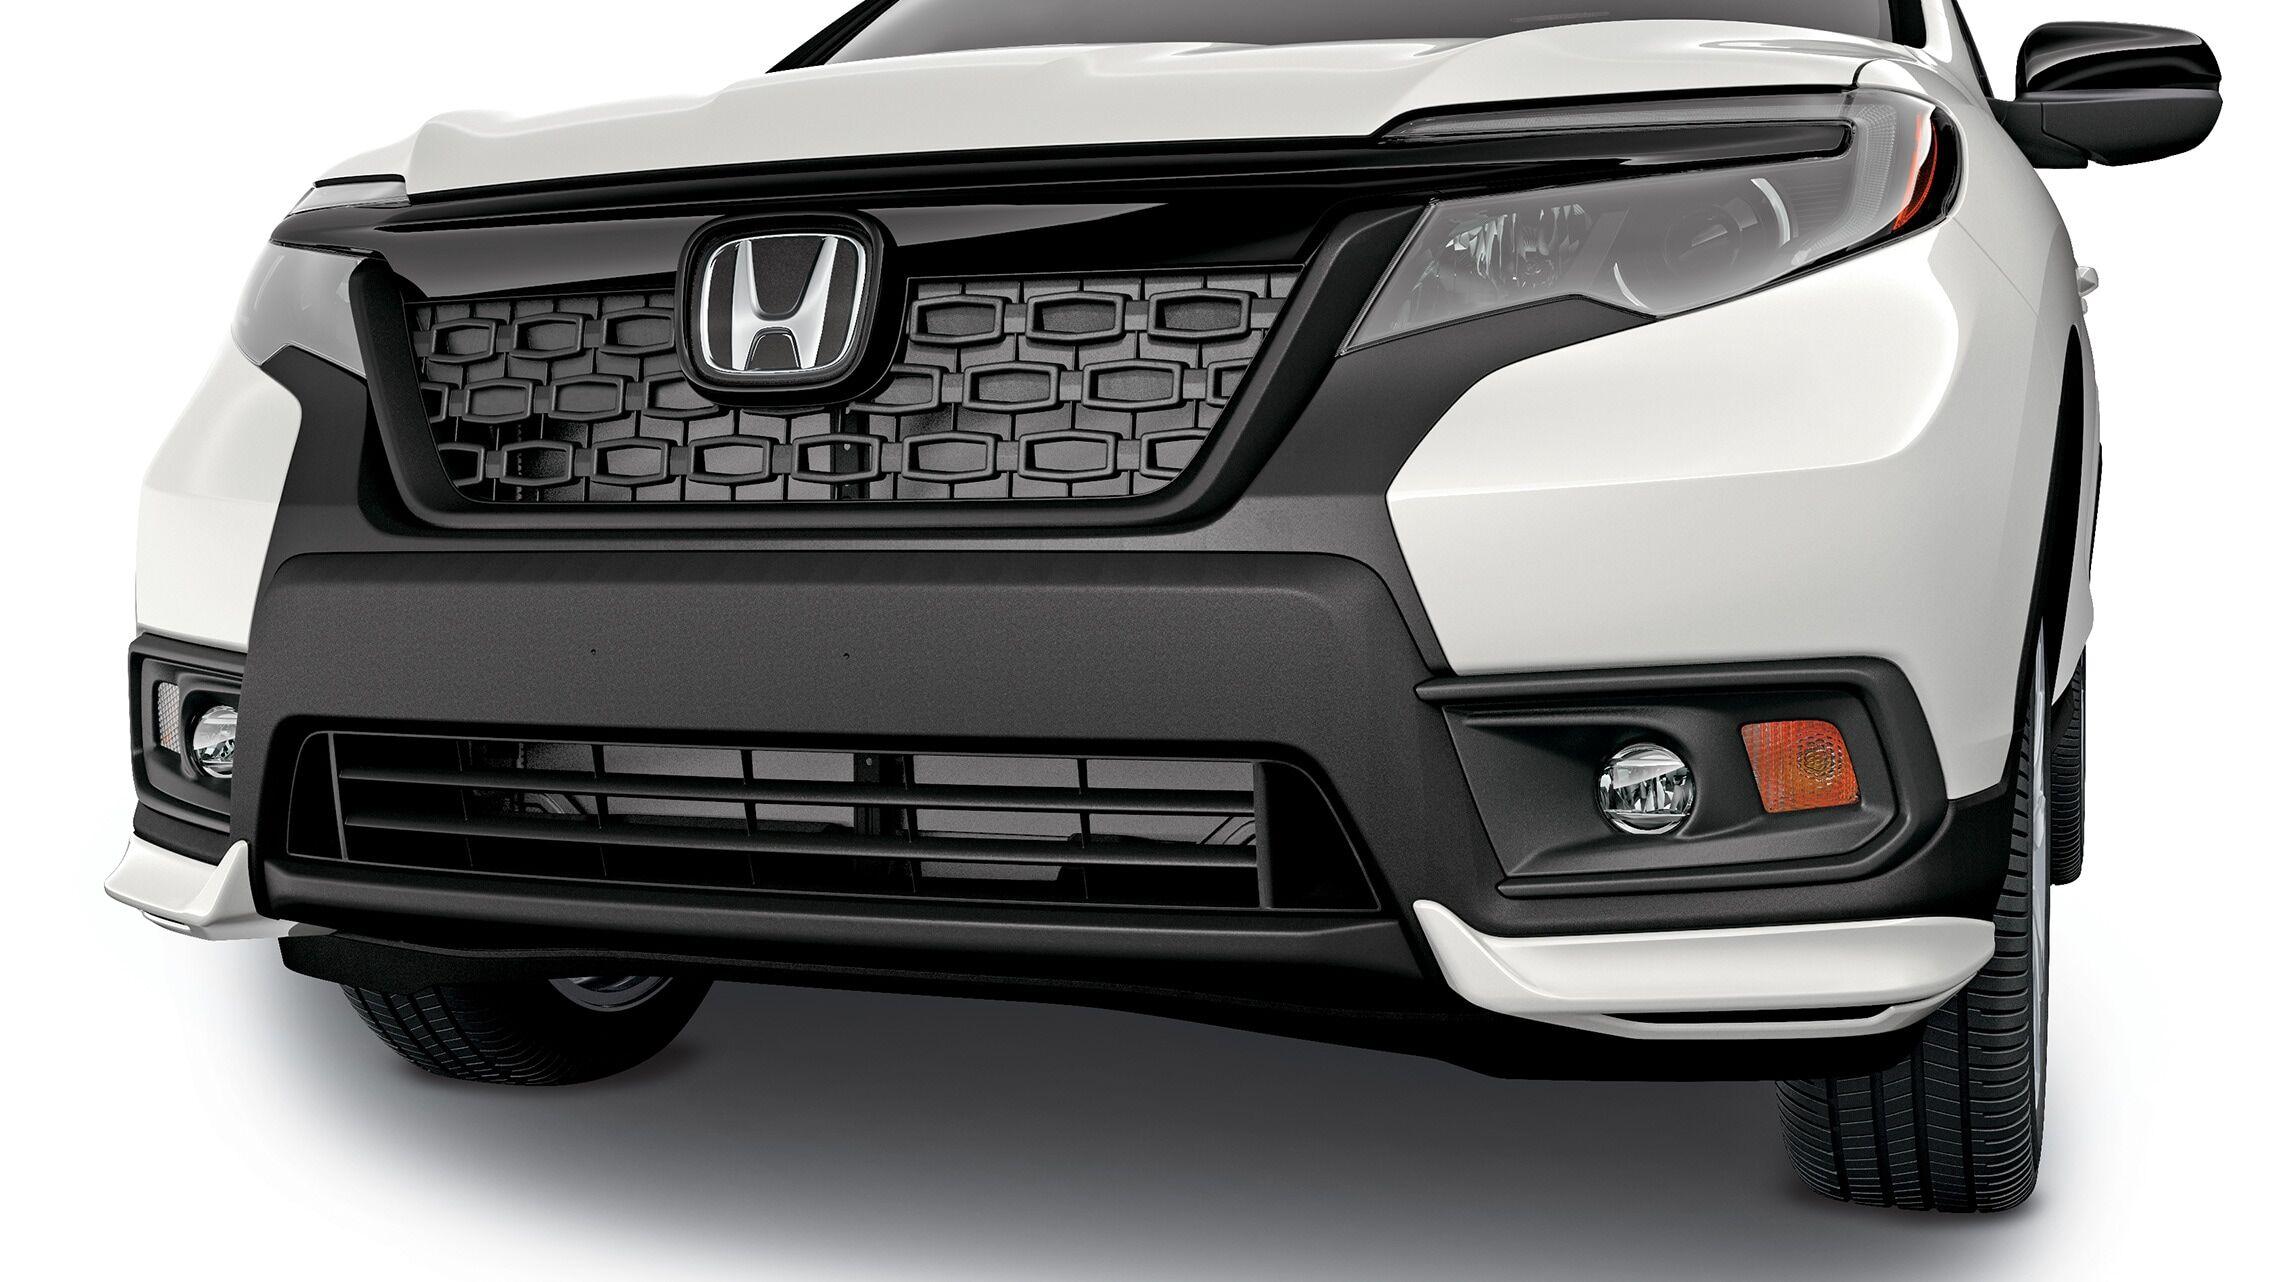 Honda Passport Accessory - Underbody Spoiler